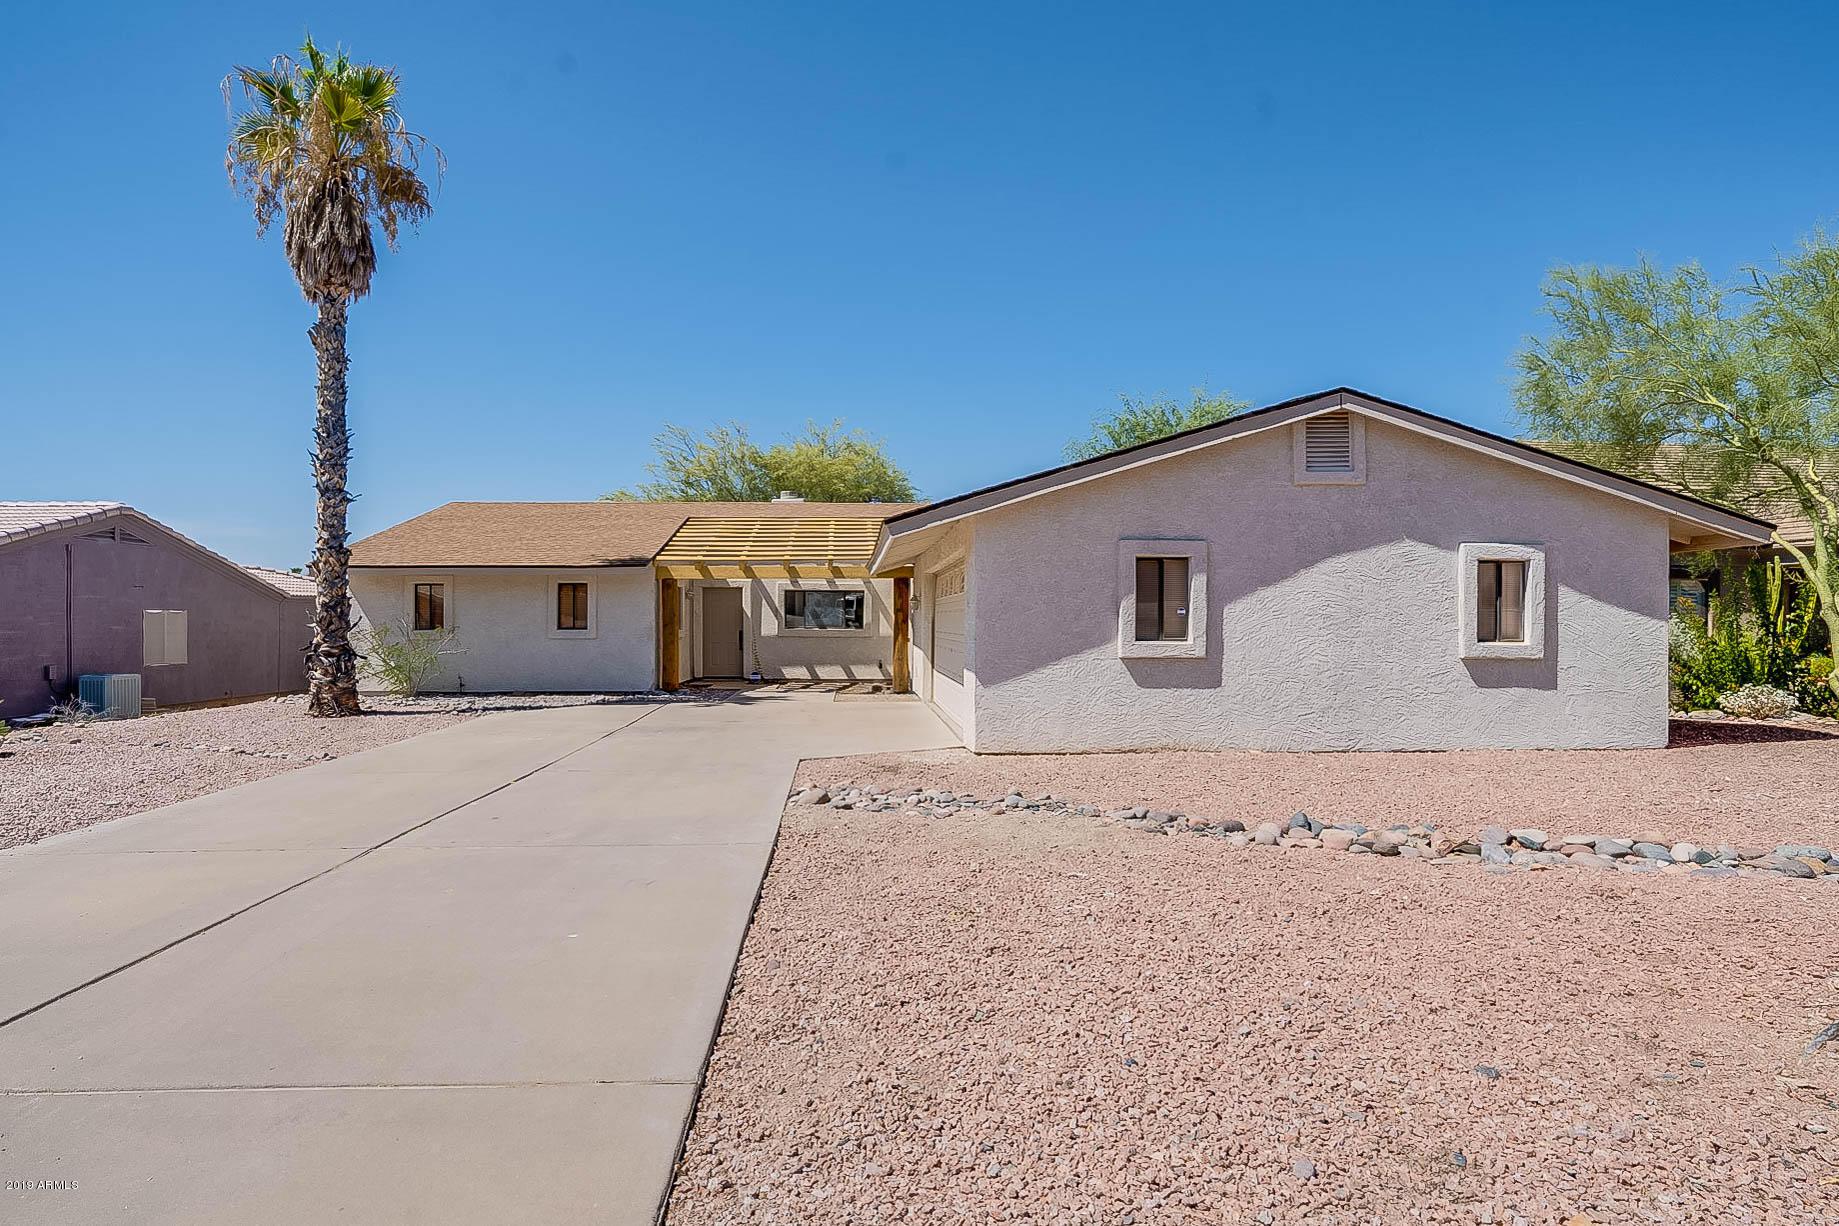 Photo of 14838 N CALLE DEL PRADO --, Fountain Hills, AZ 85268